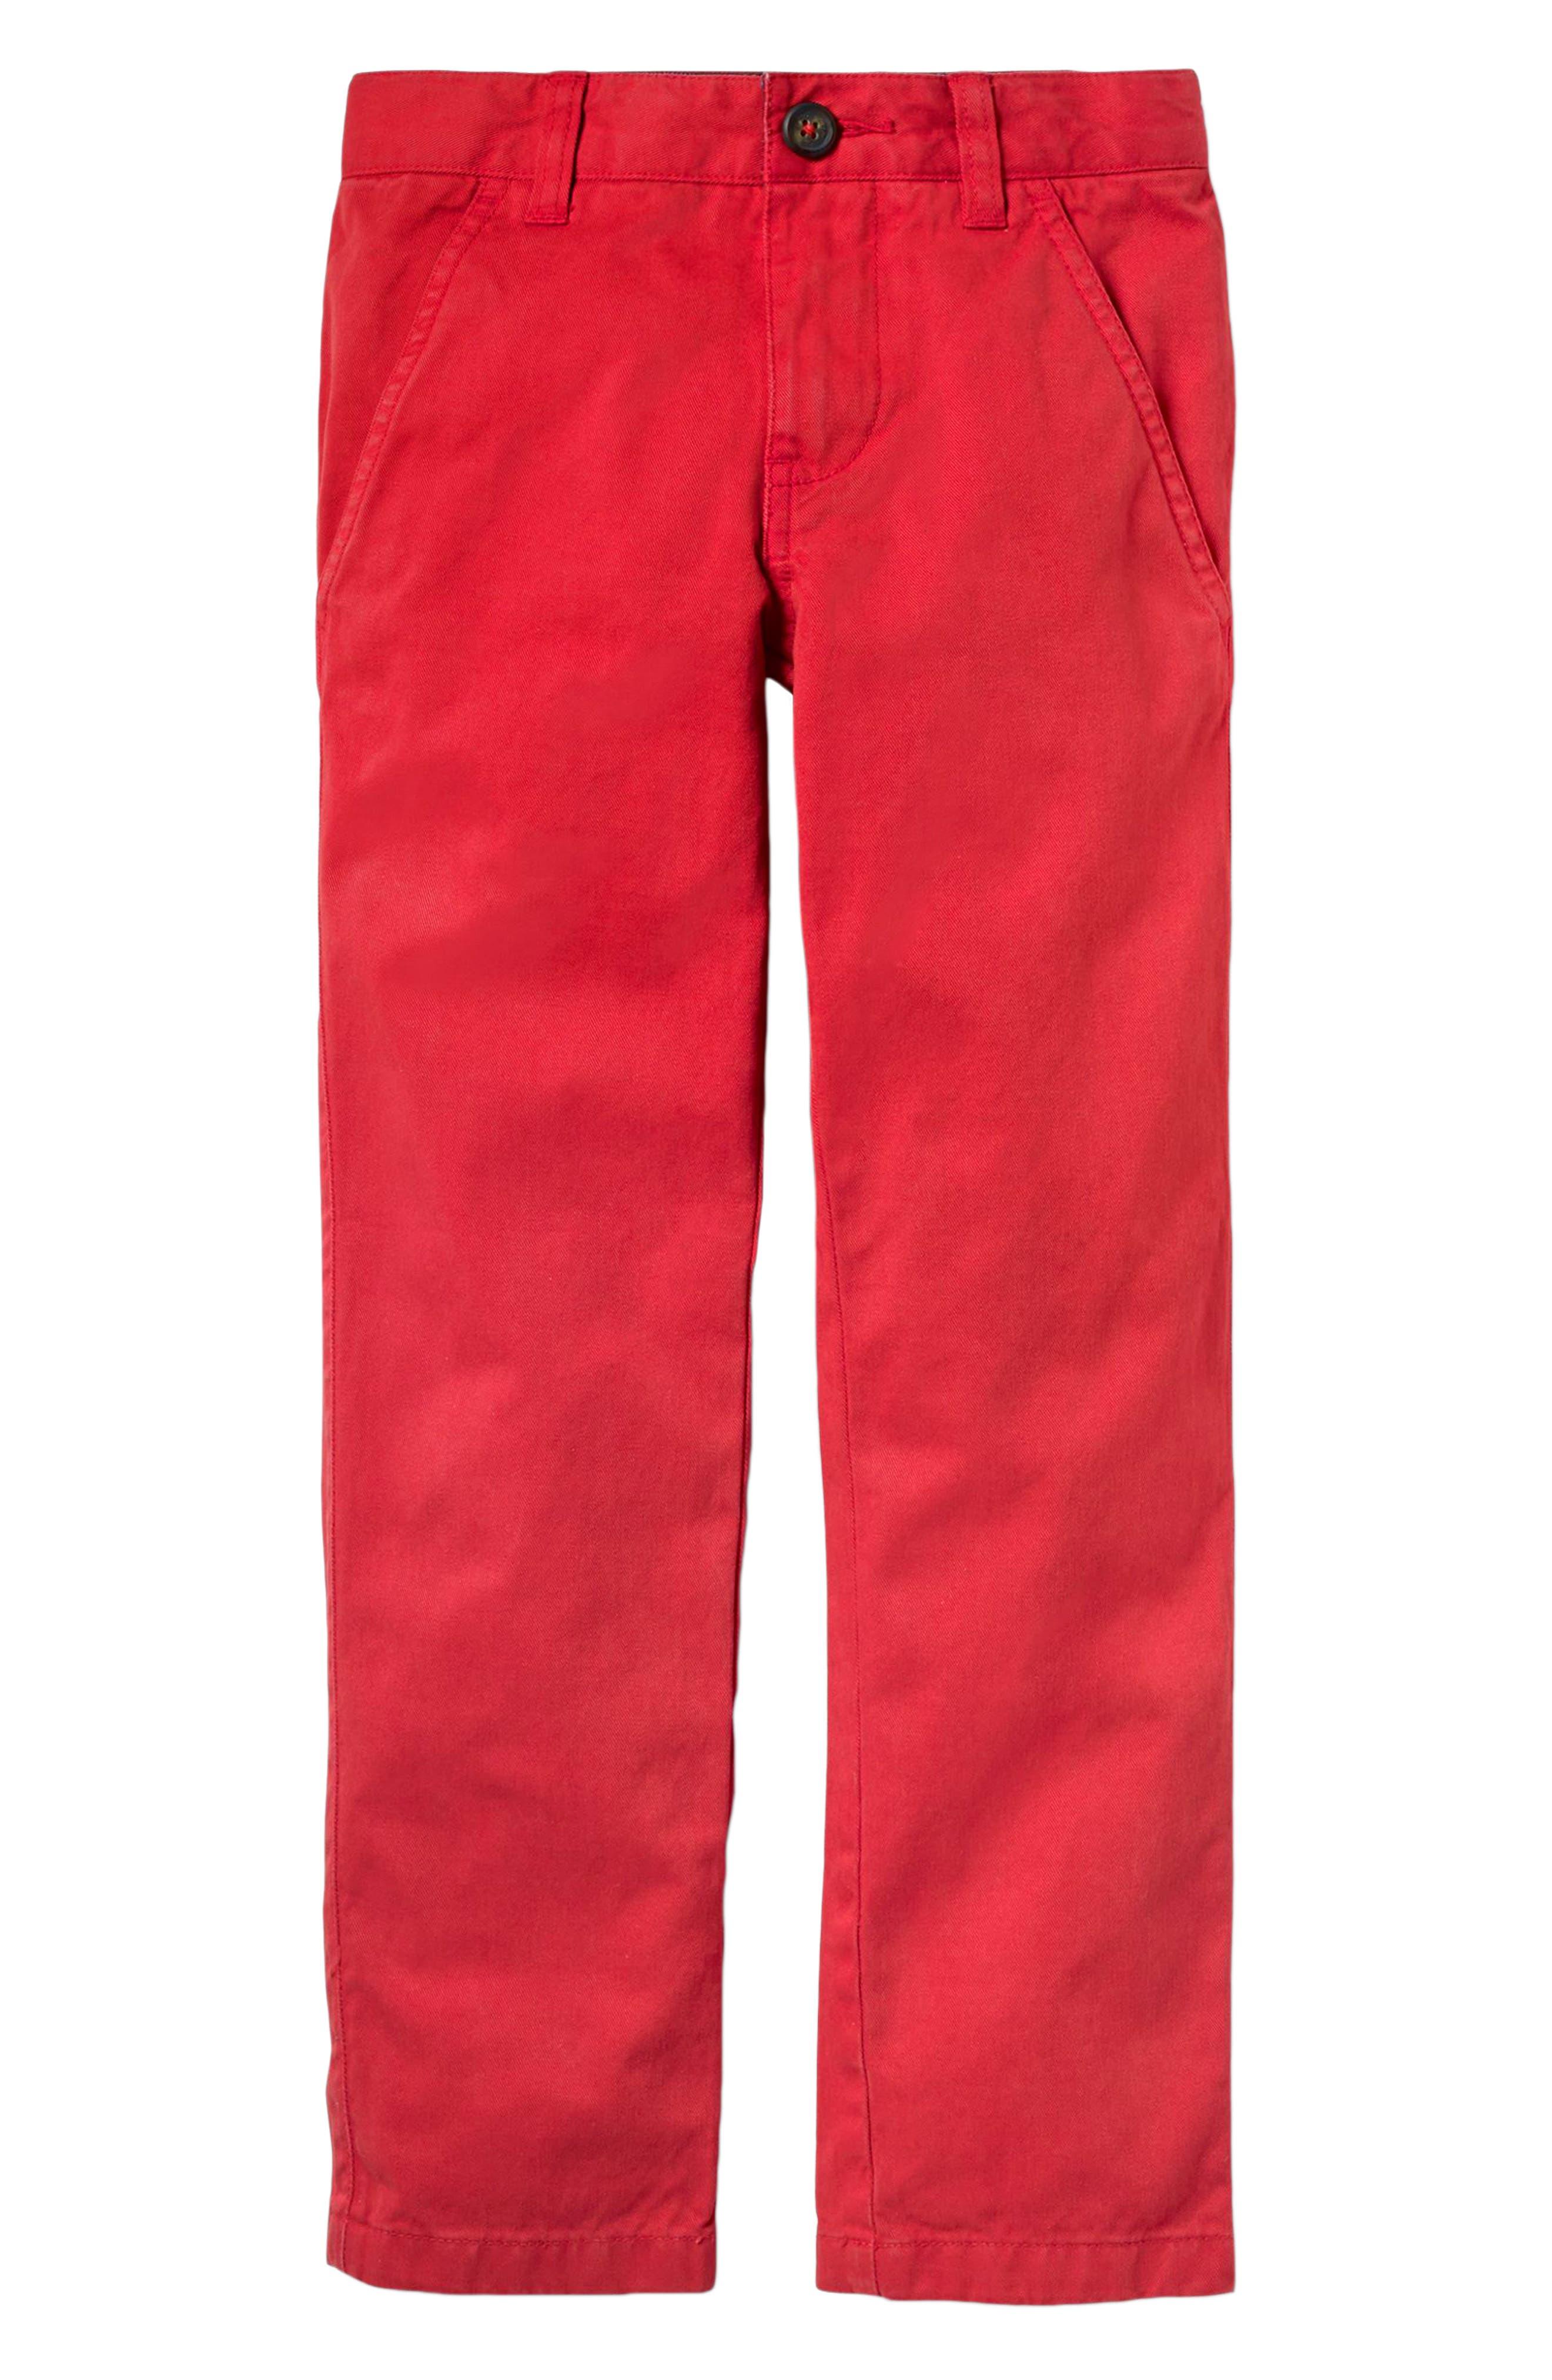 Chino Pants,                         Main,                         color, Salsa Red